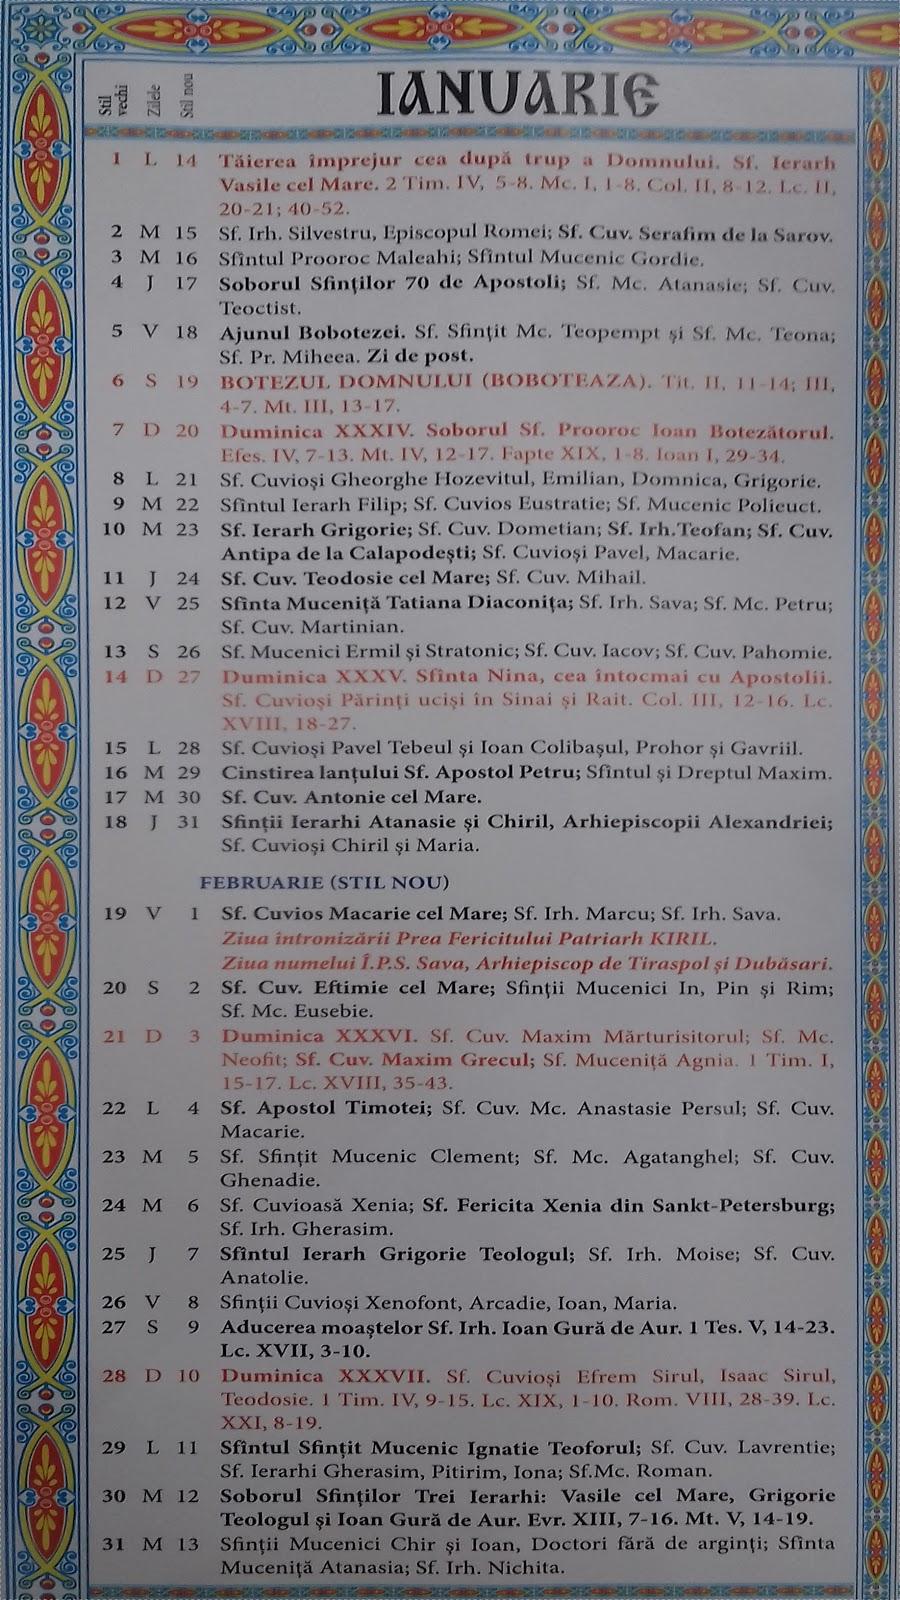 Calendar Crestin Ortodox 2022.Calendar Ortodox 2021 2022 Moldova Calendar Crestin Ortodox 2019 Stil Vechi Republica Moldova